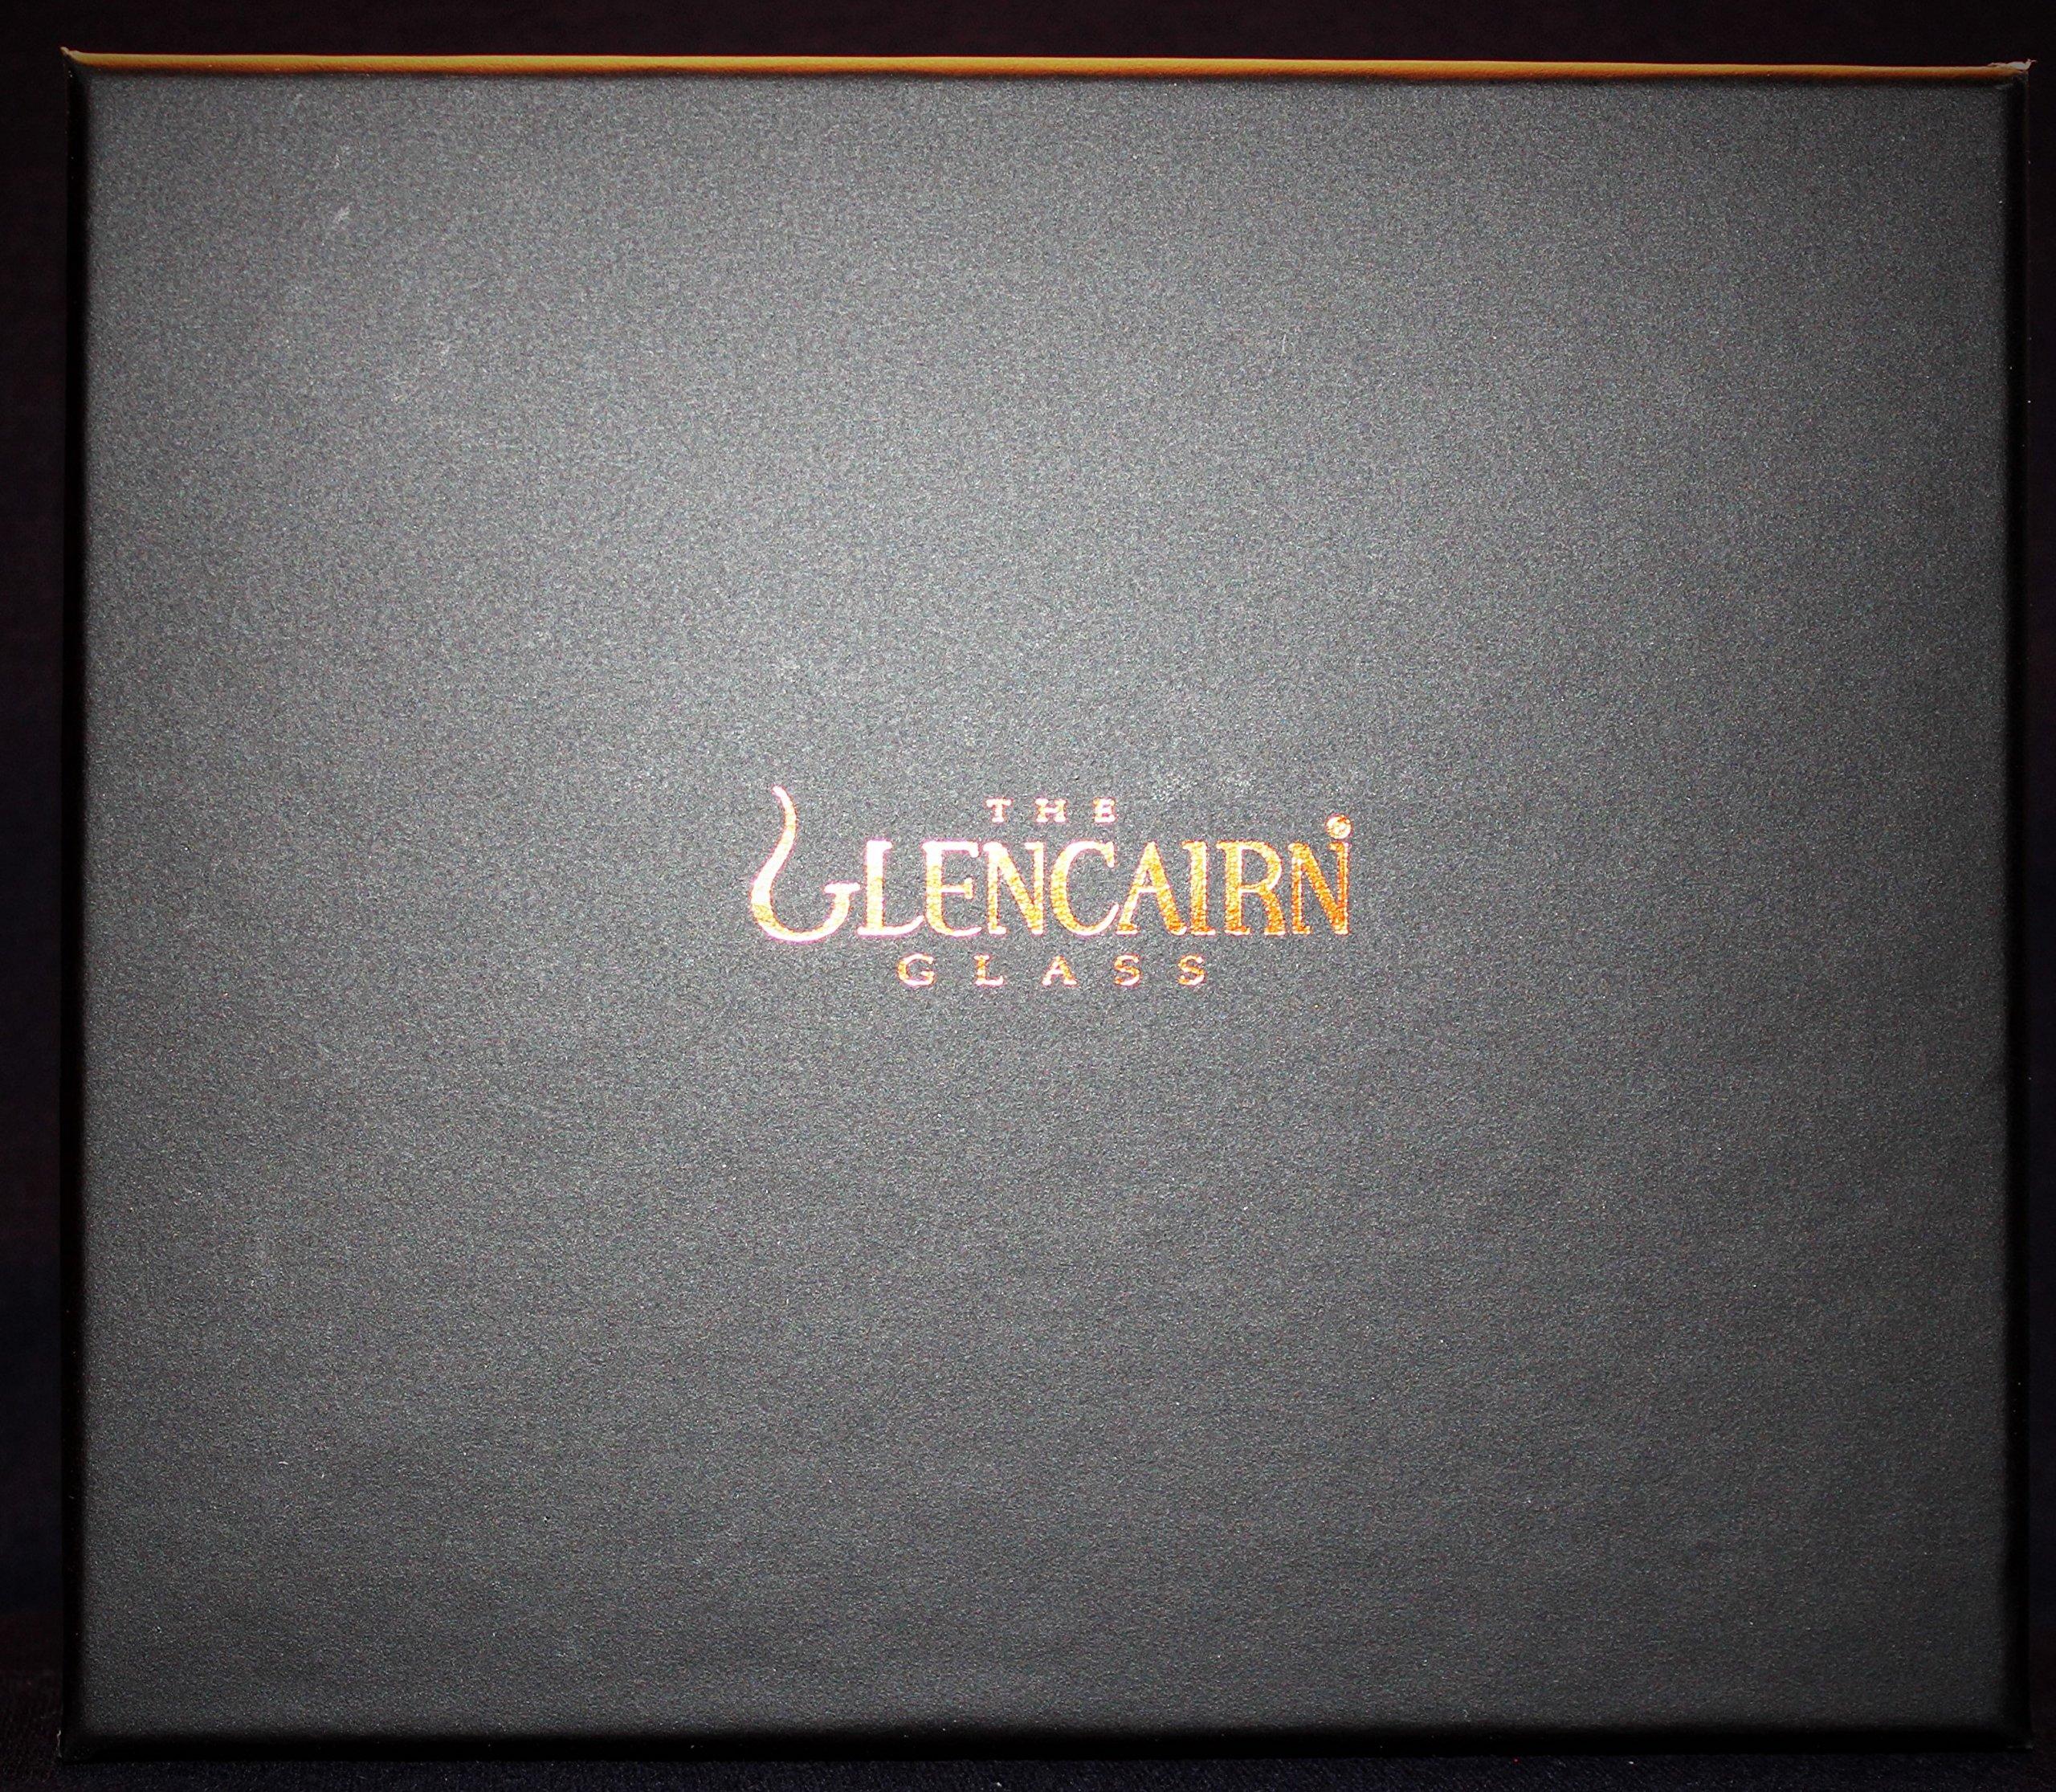 The Glencairn Diamond Cut Two Glass Boxed Set